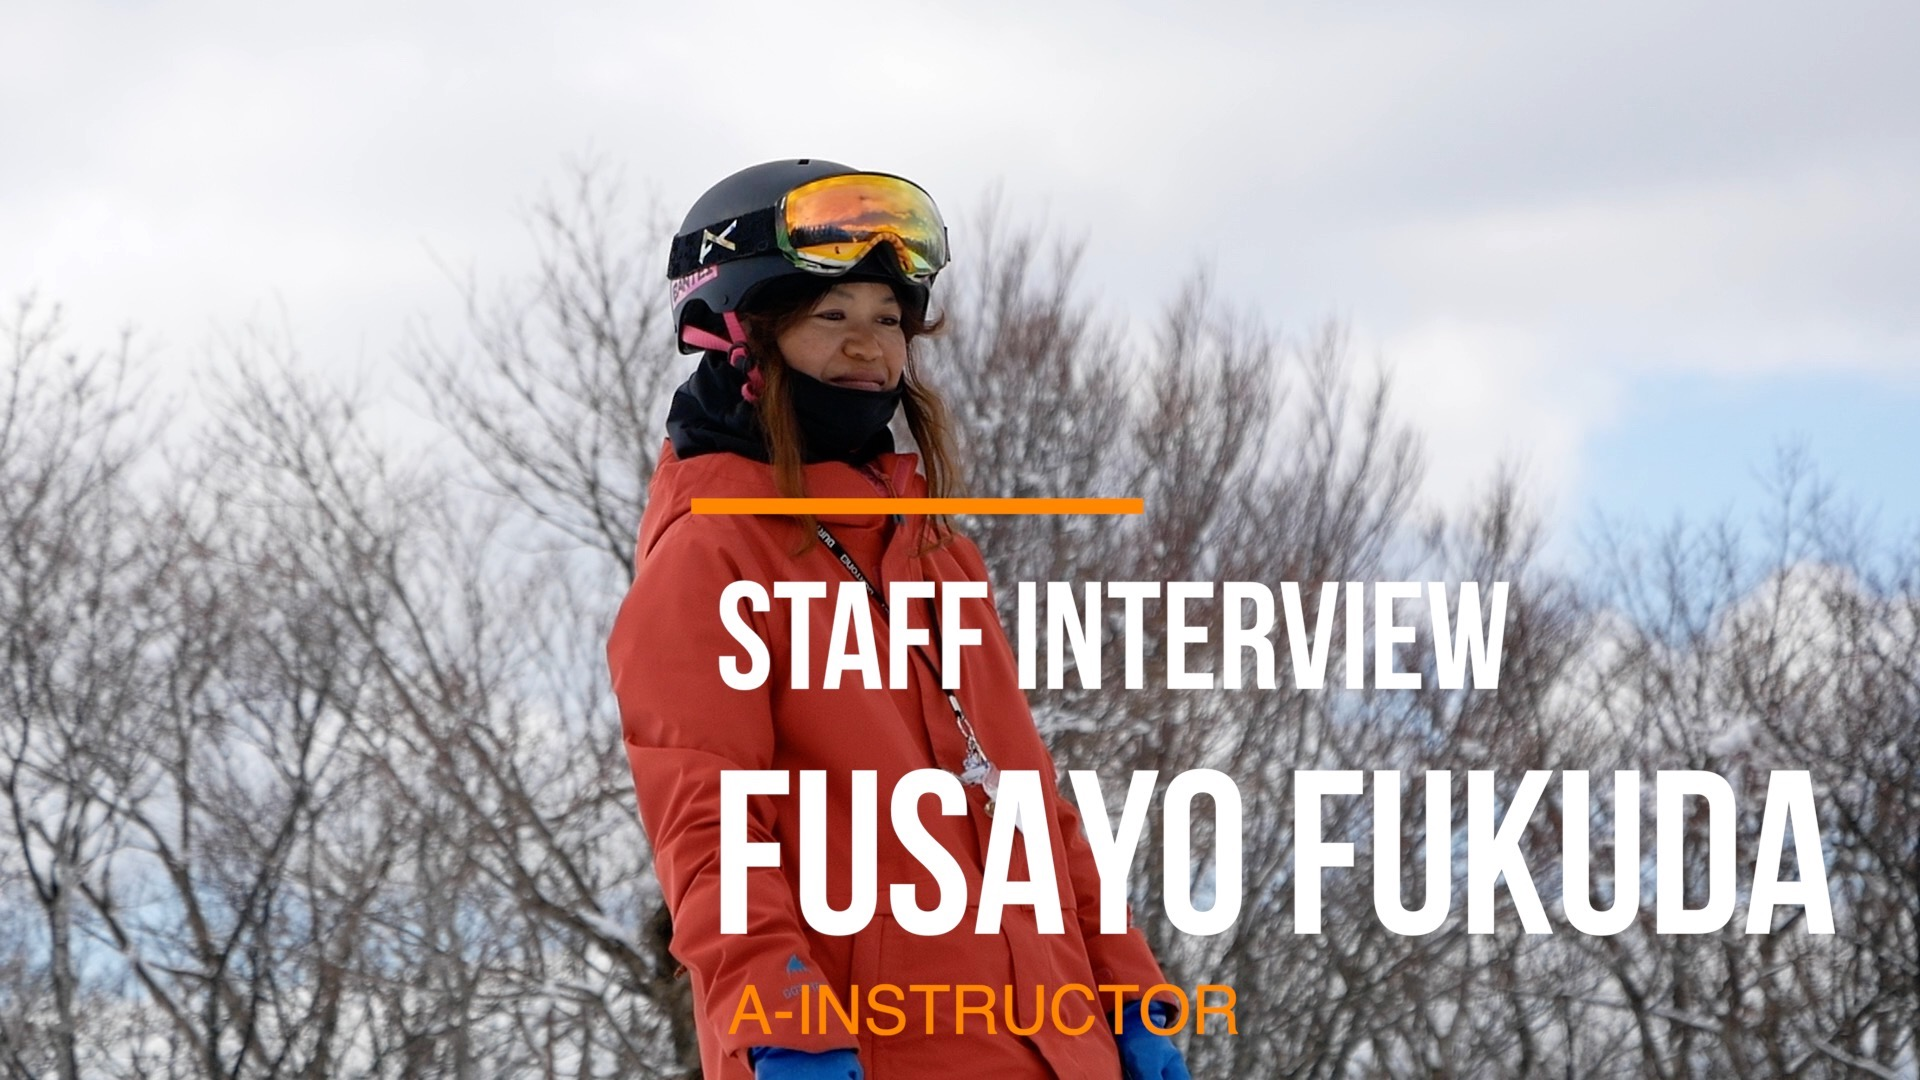 STAFF INTERVIEW [FUSAYO FUKUDA]